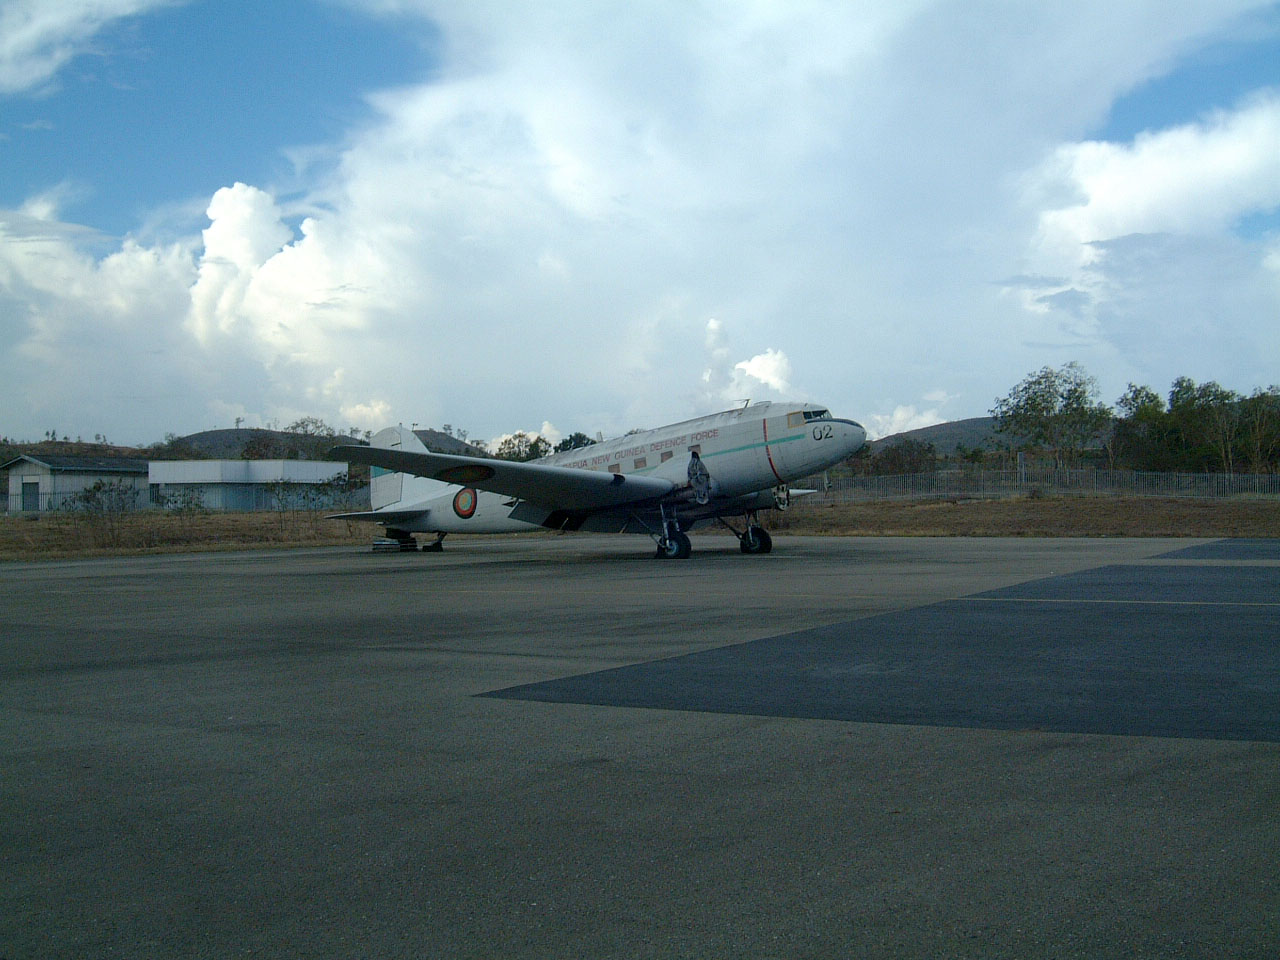 PNGDF C 47 P2 002 ex USAAF 44 76545 Derelict Jacksons Airport Sep 2002 03